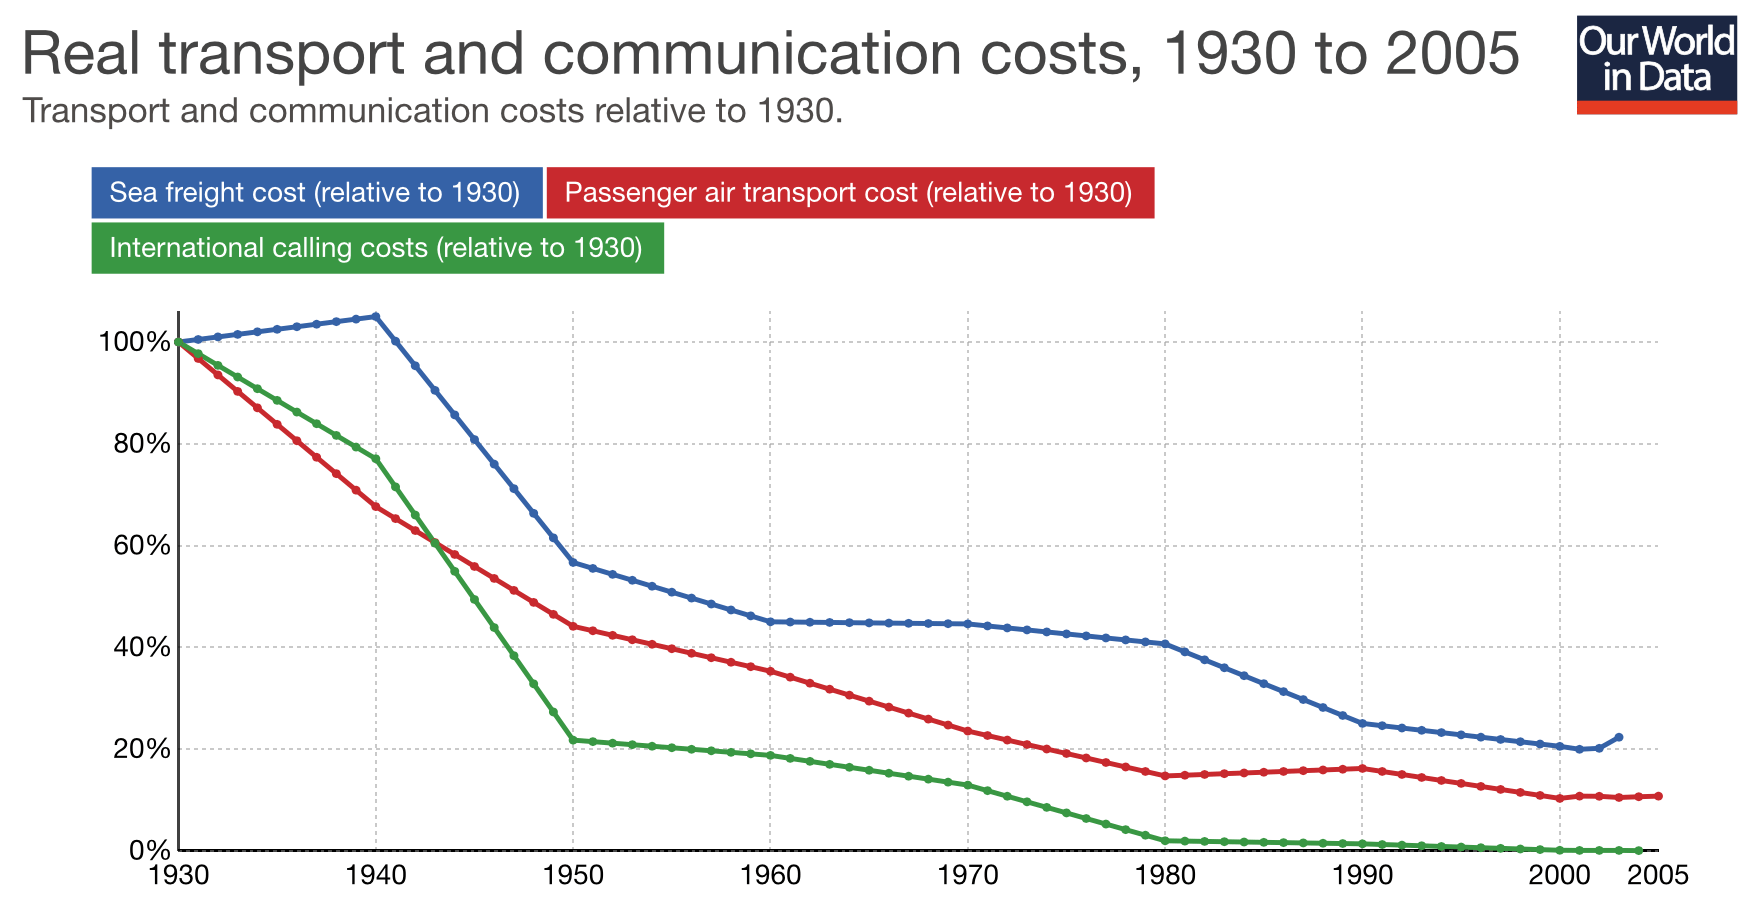 Figure 2. Source: https://ourworldindata.org/international-trade